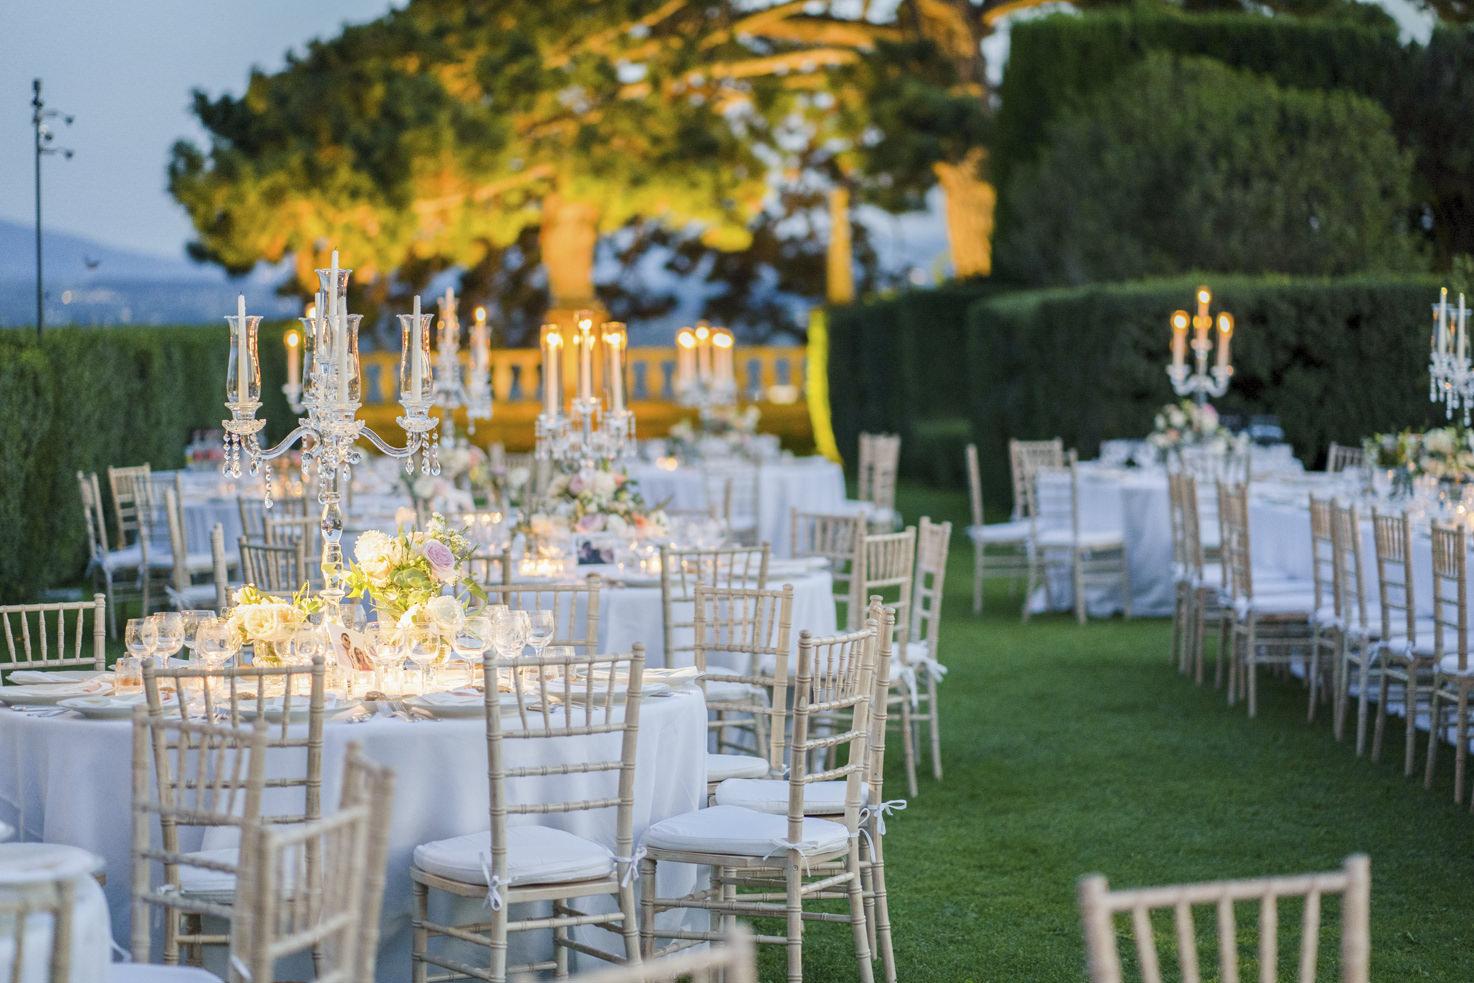 Wedding banquet in the gardens of Villa Gamberaia